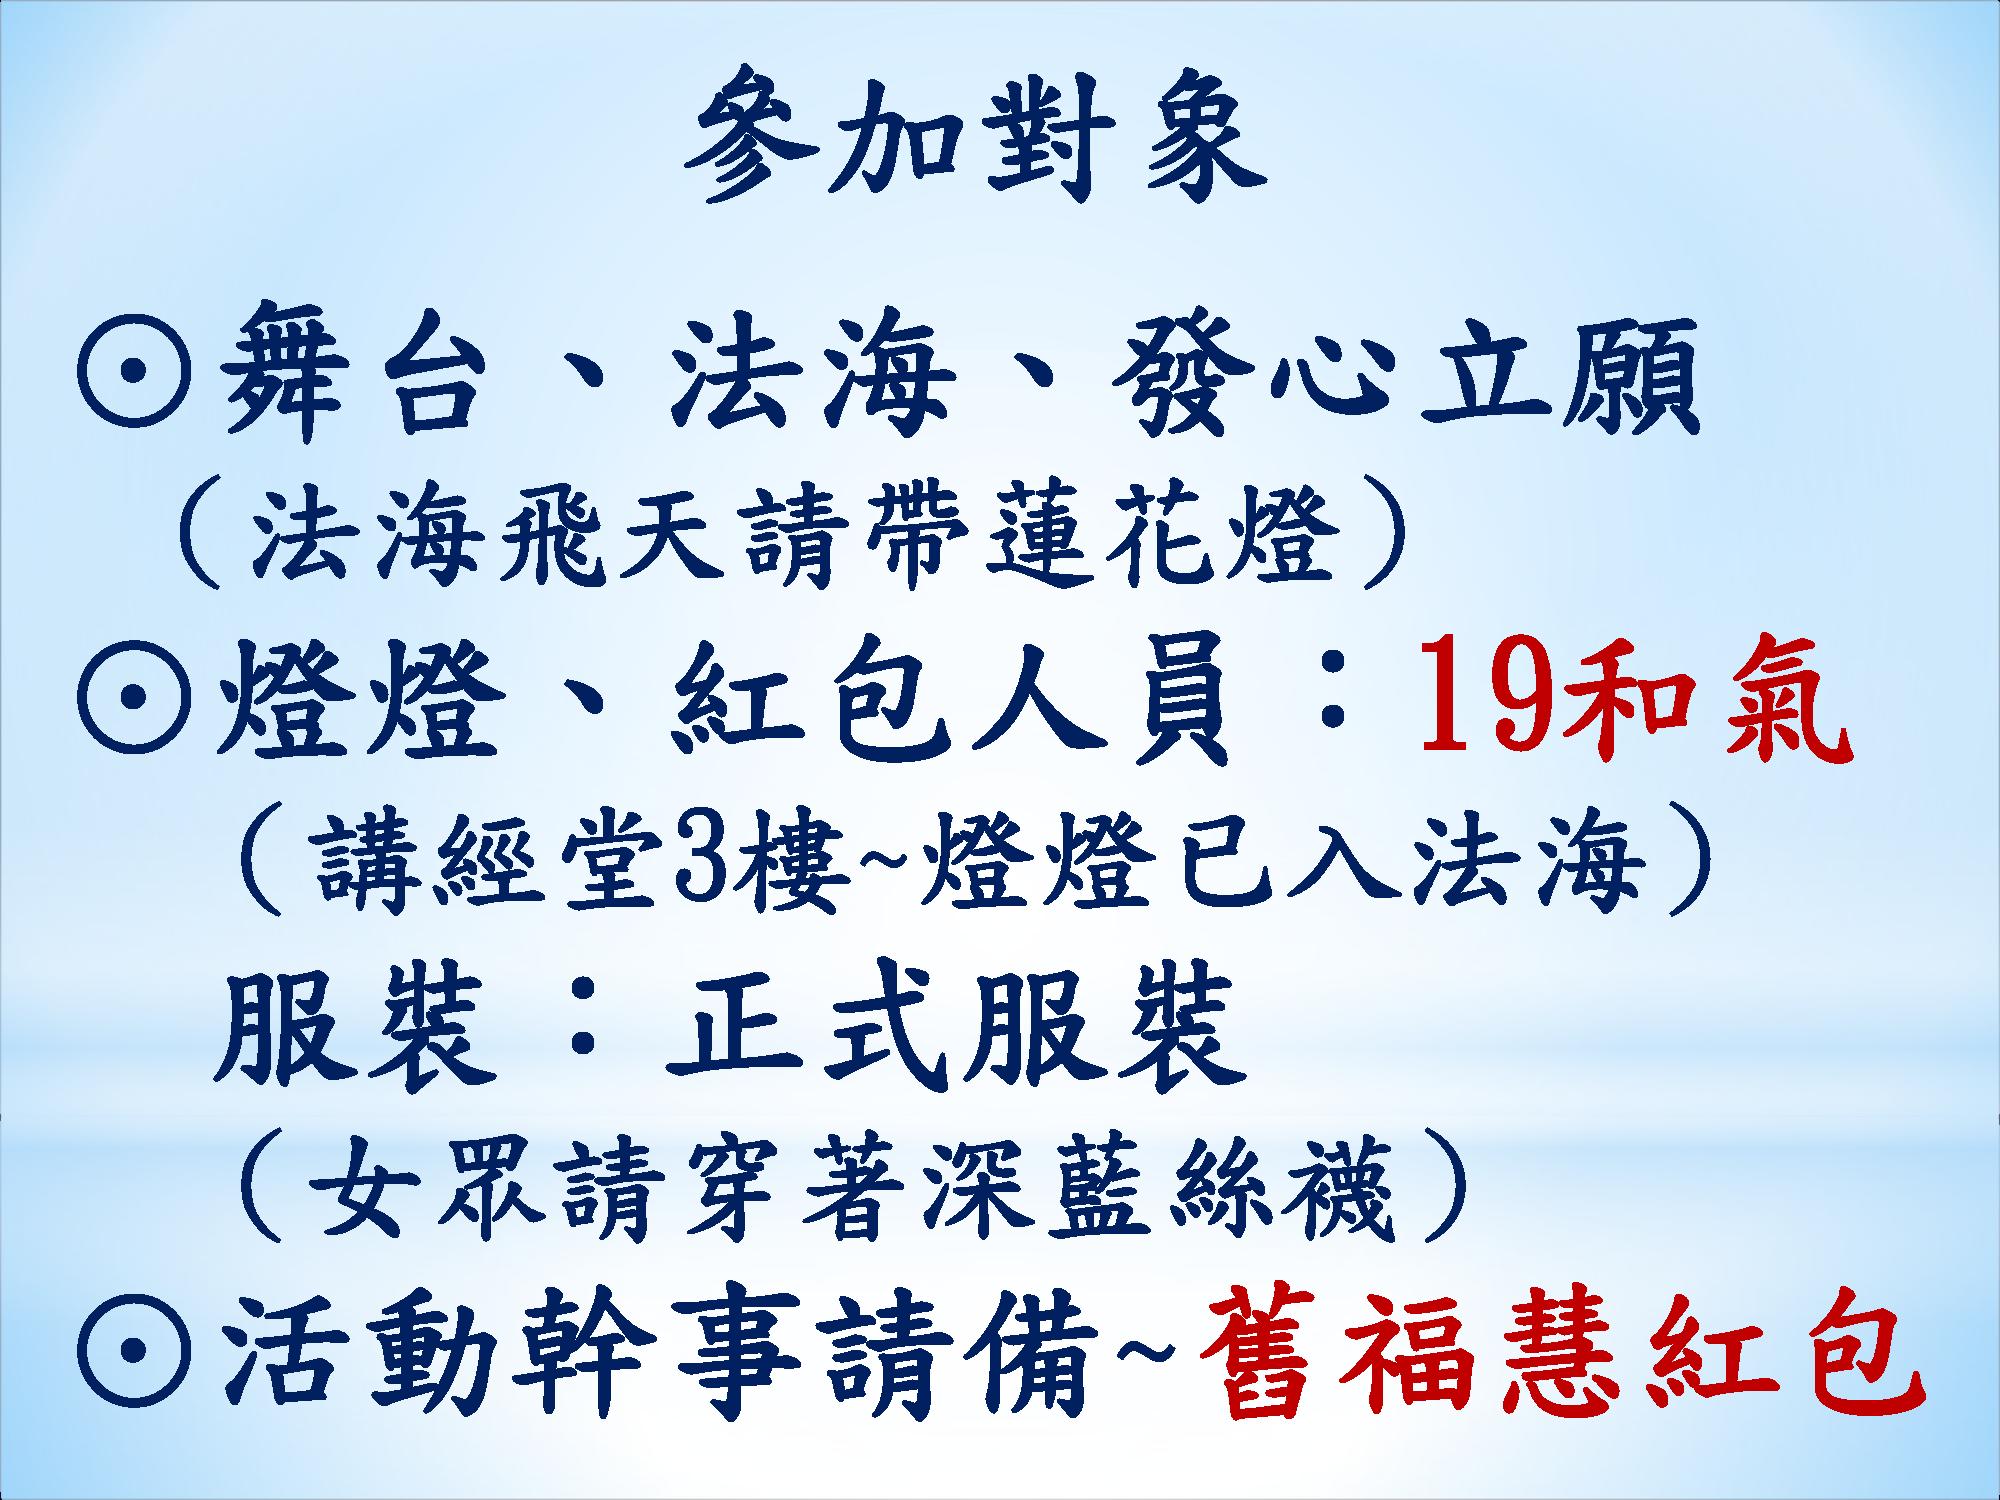 總彩排_頁面_4.png